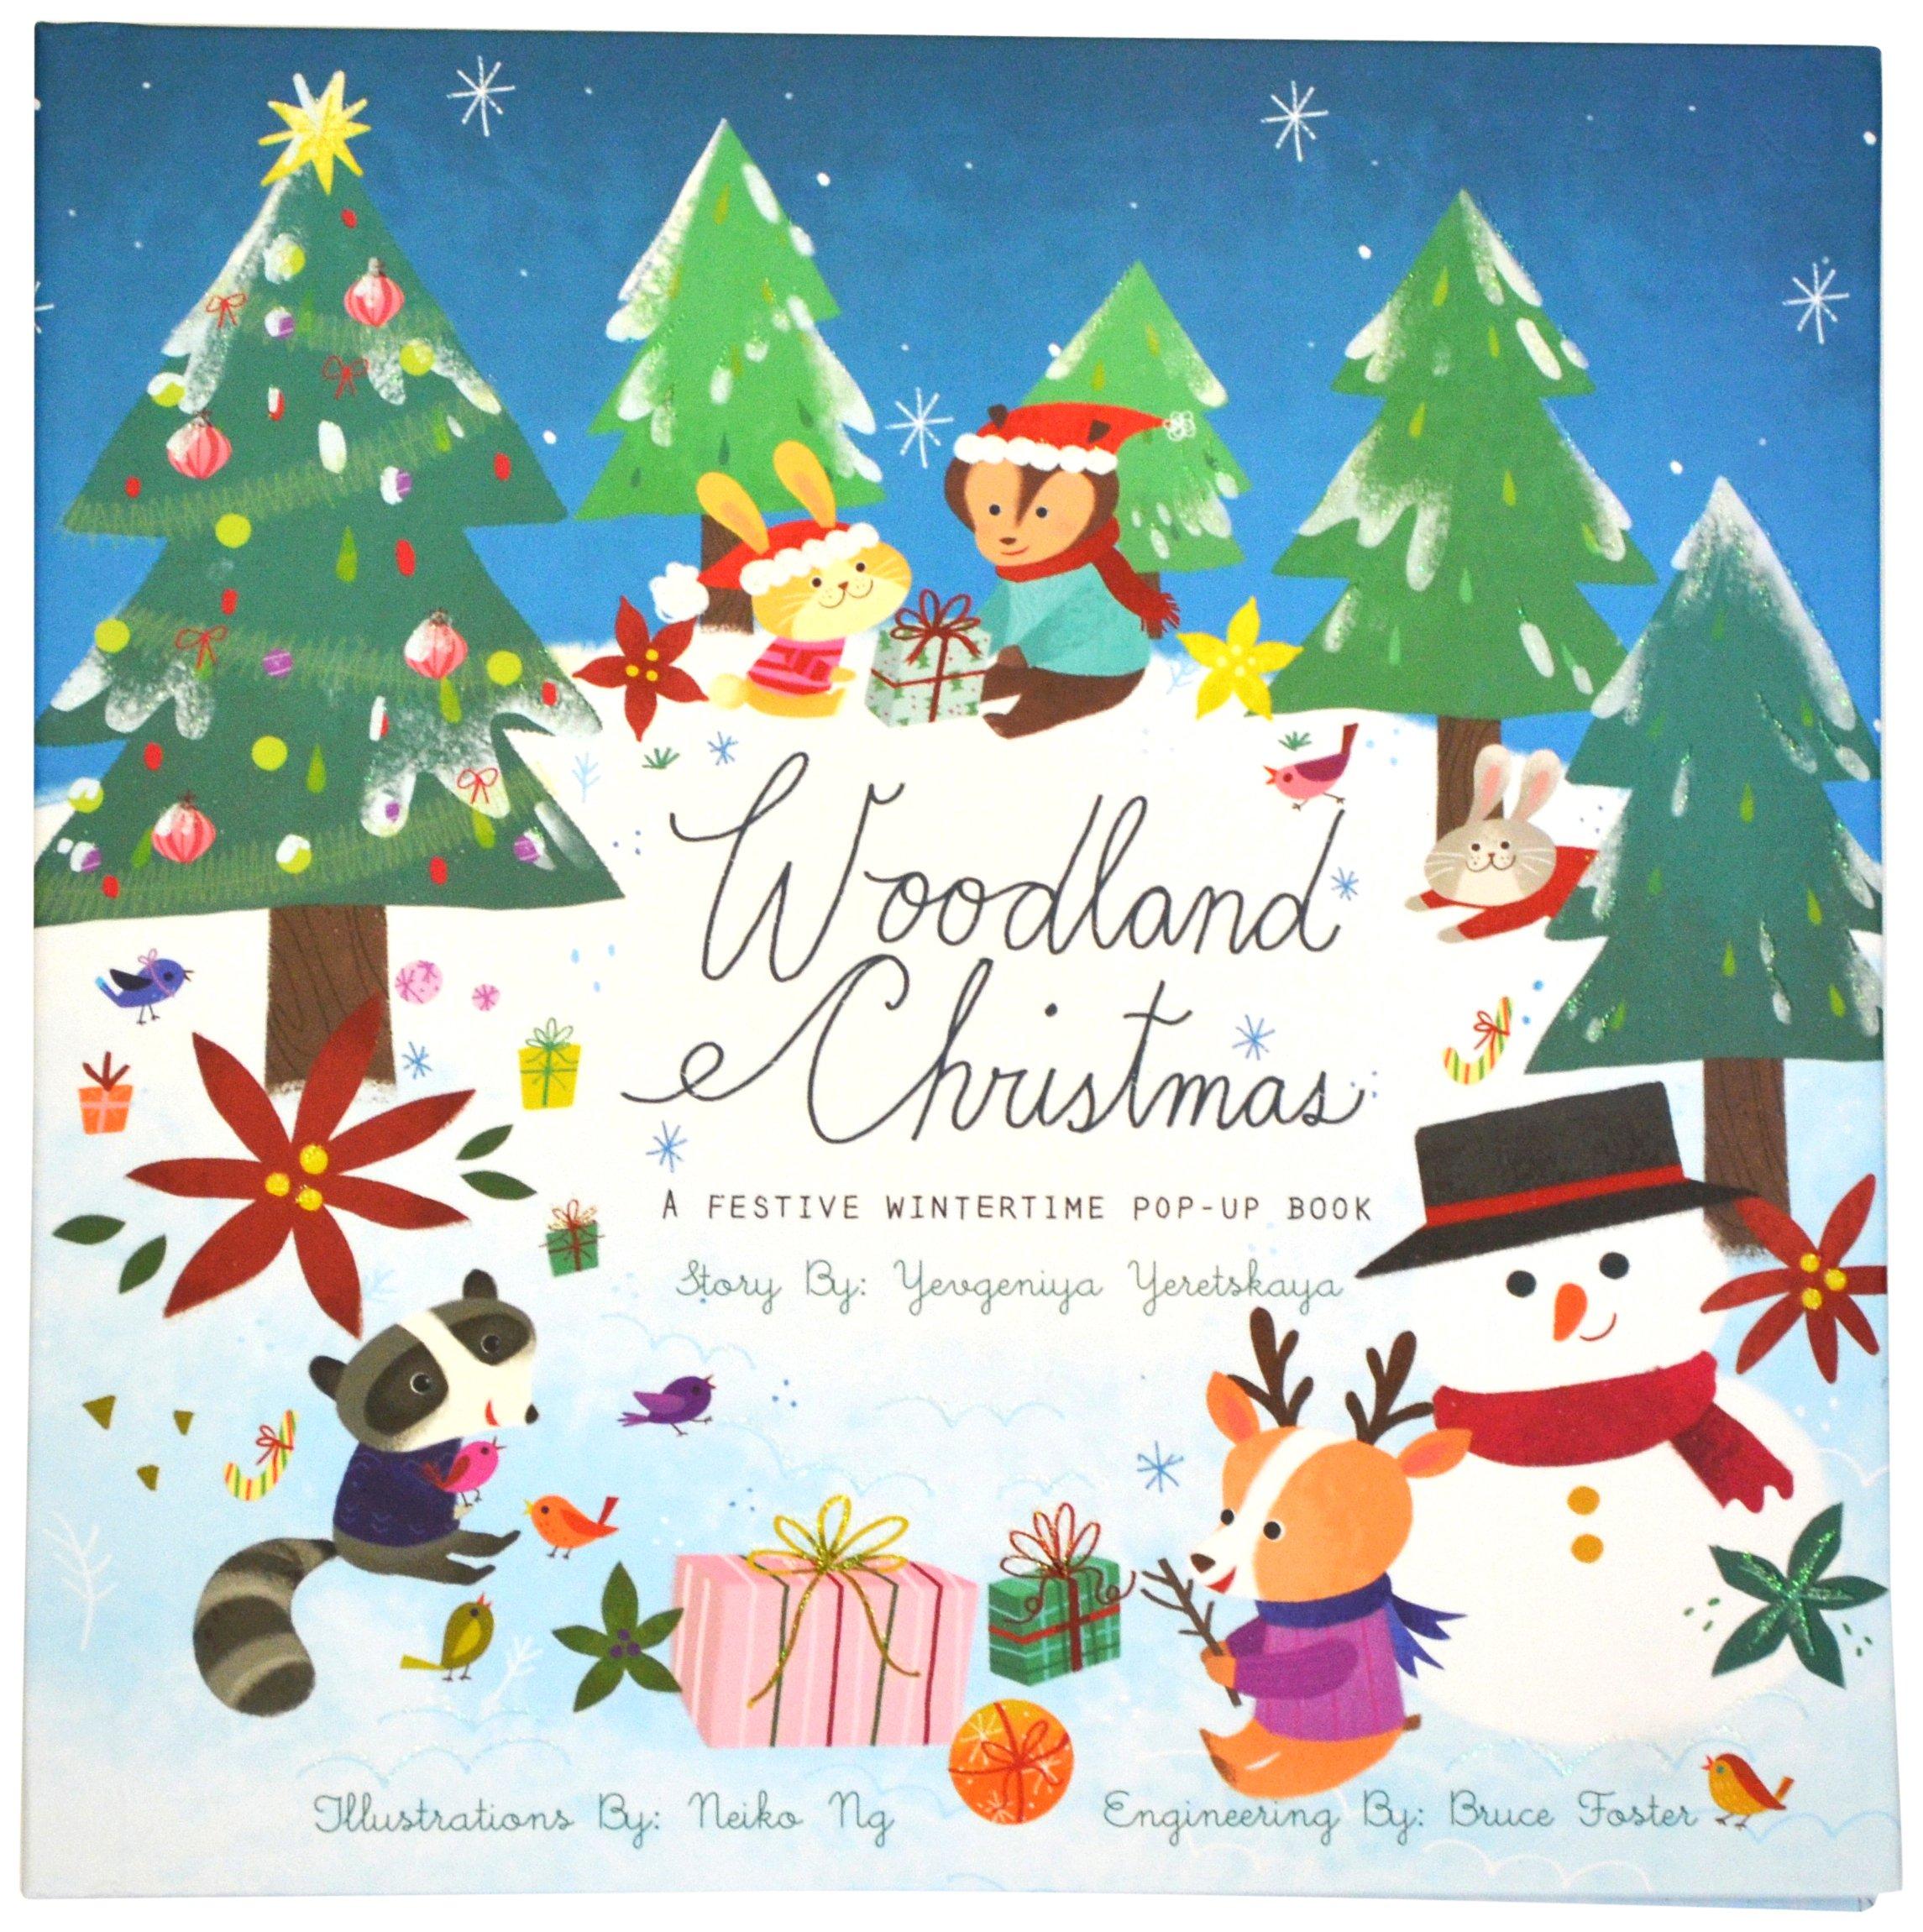 woodland christmas a festive wintertime pop up book yevgeniya yeretskaya neiko ng 9781605809540 amazoncom books - Woodland Christmas